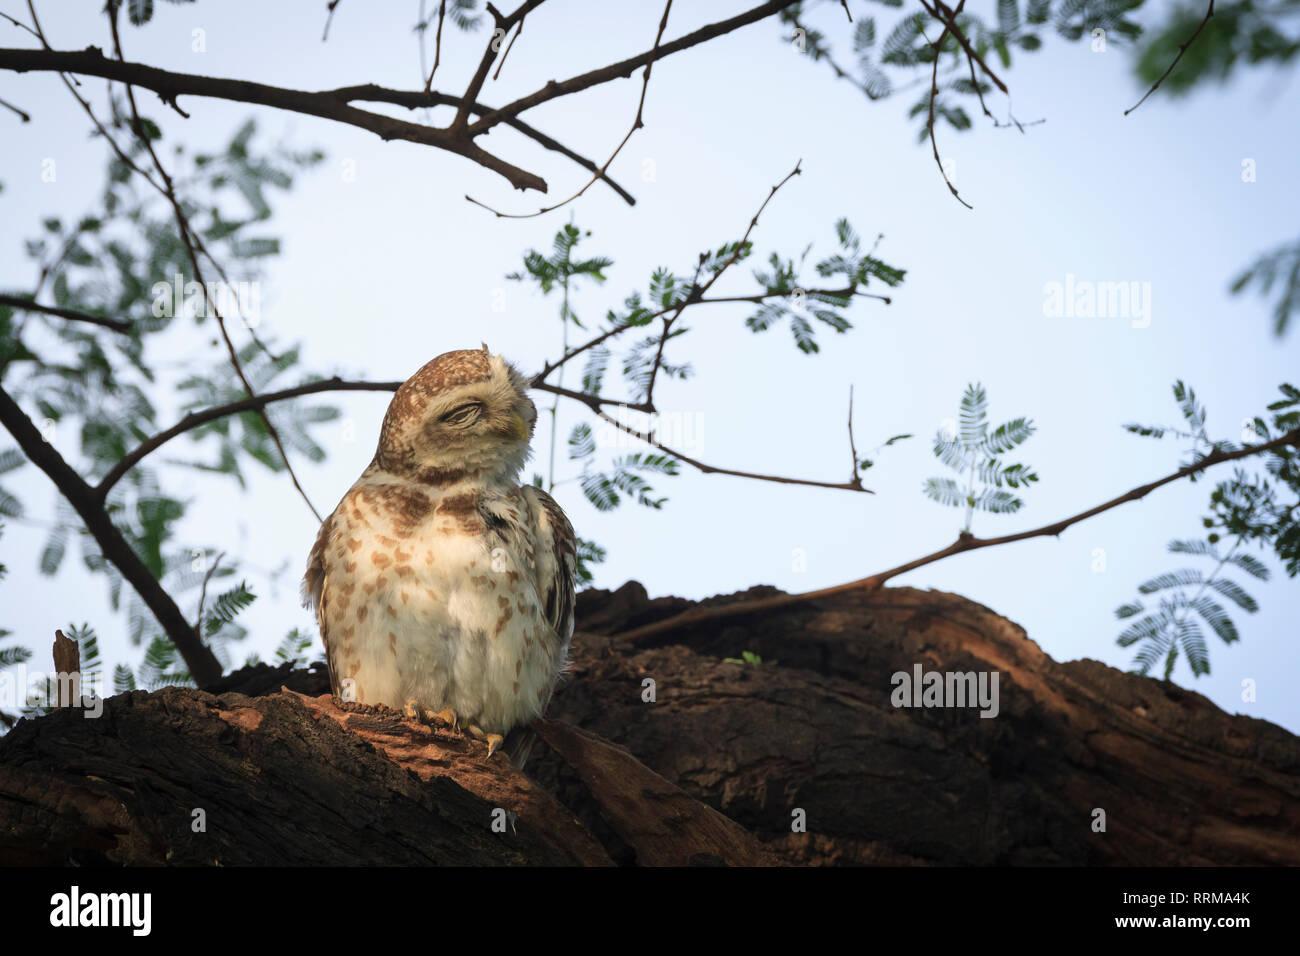 Spotted Owlet (Athene brama) preening feathers. Keoladeo National Park. Bharatpur. Rajasthan. India. - Stock Image